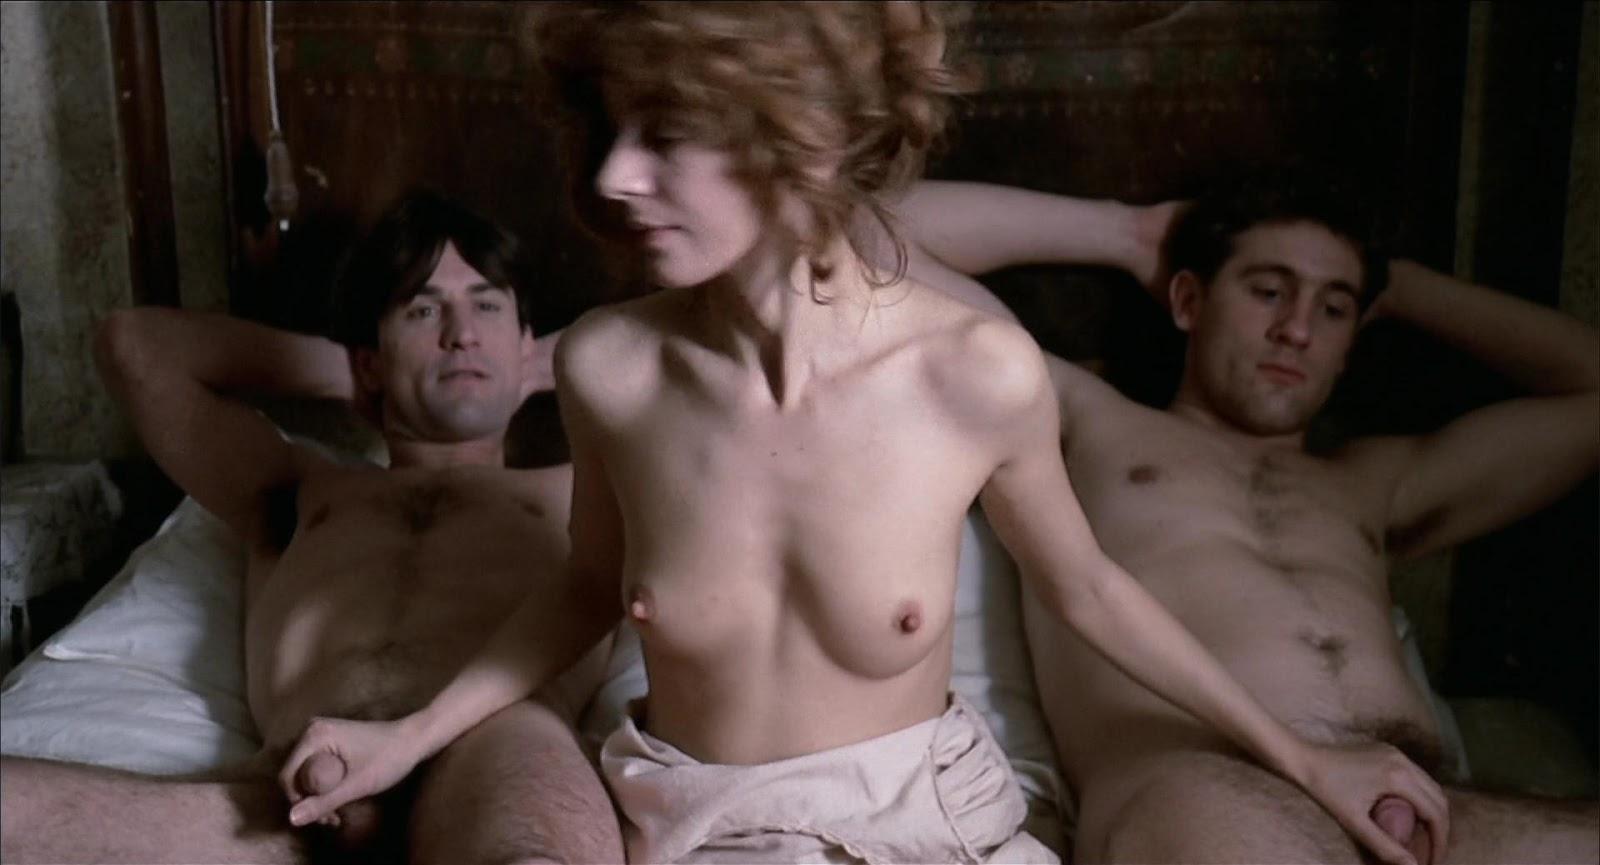 Soccer lads naked-7488